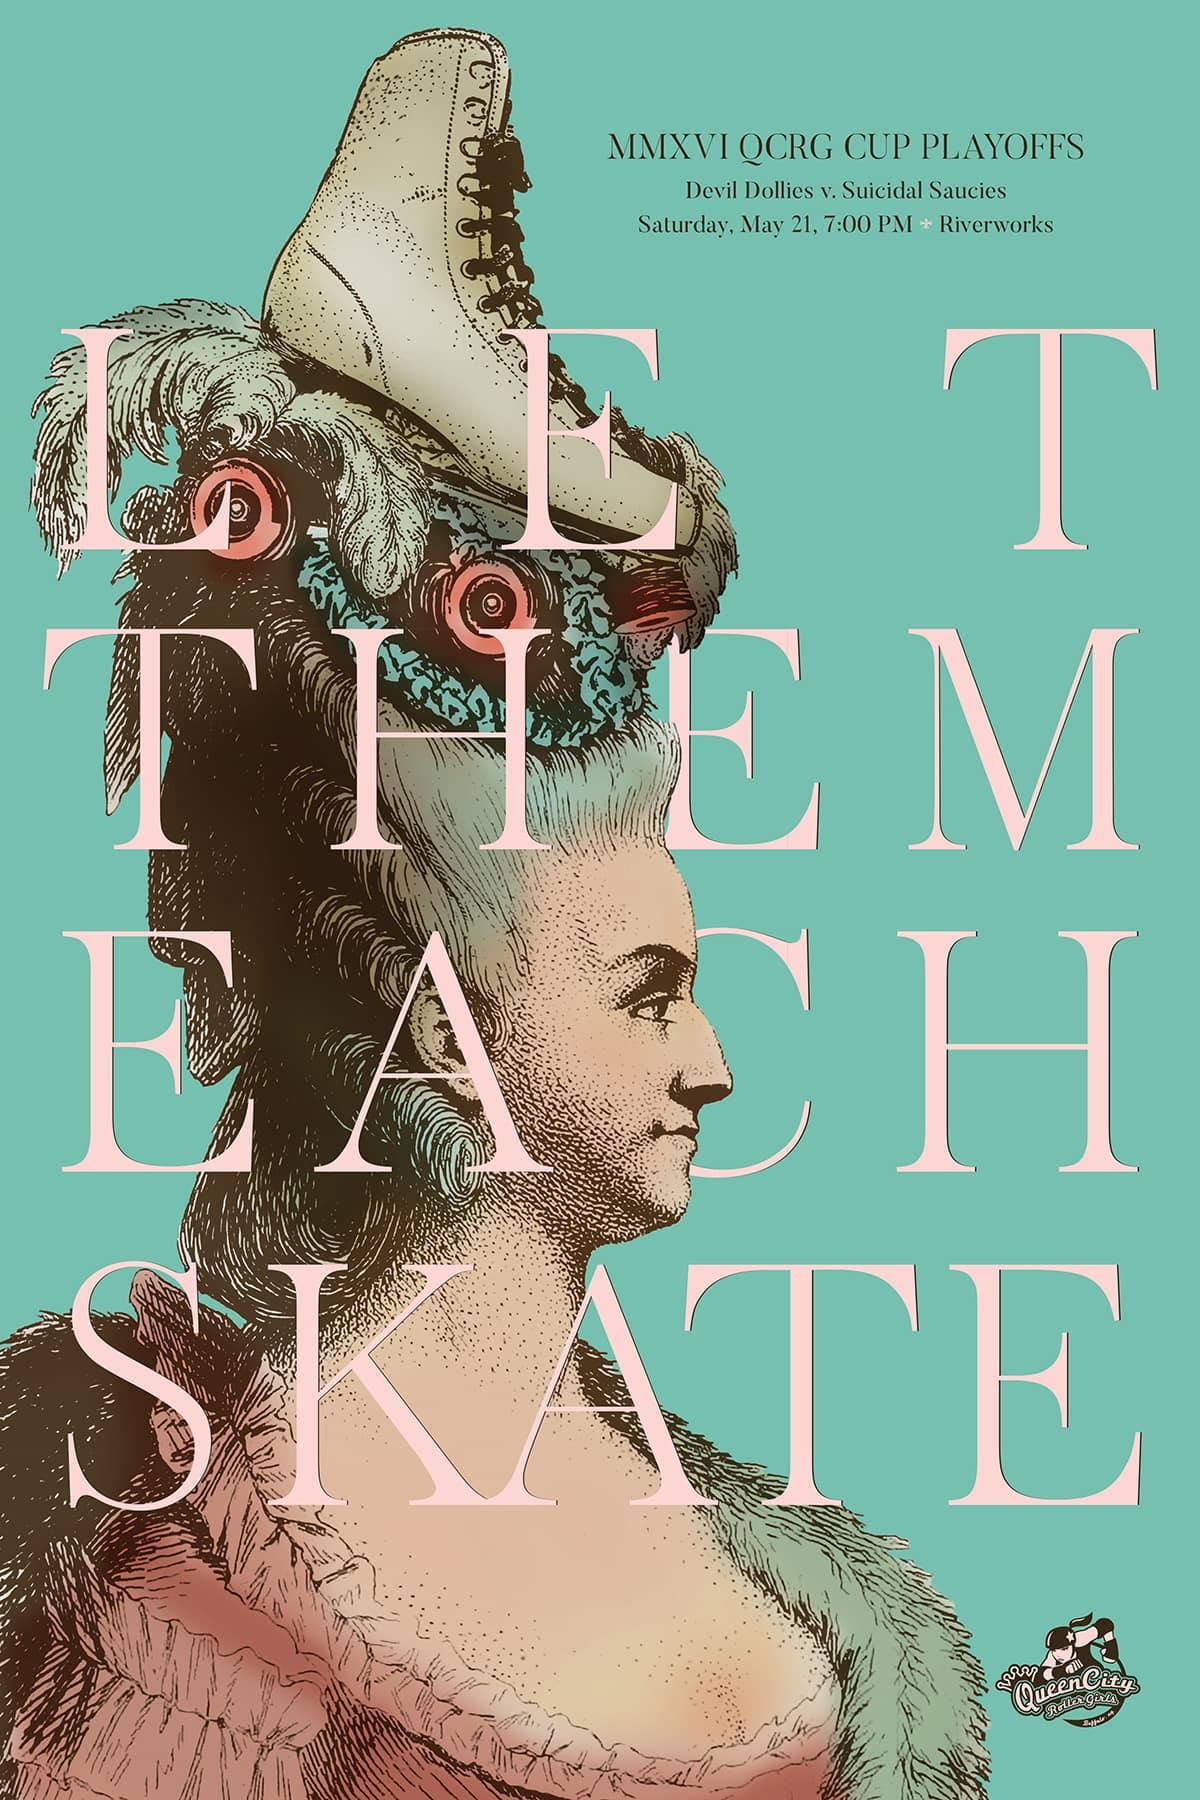 Let them each skate